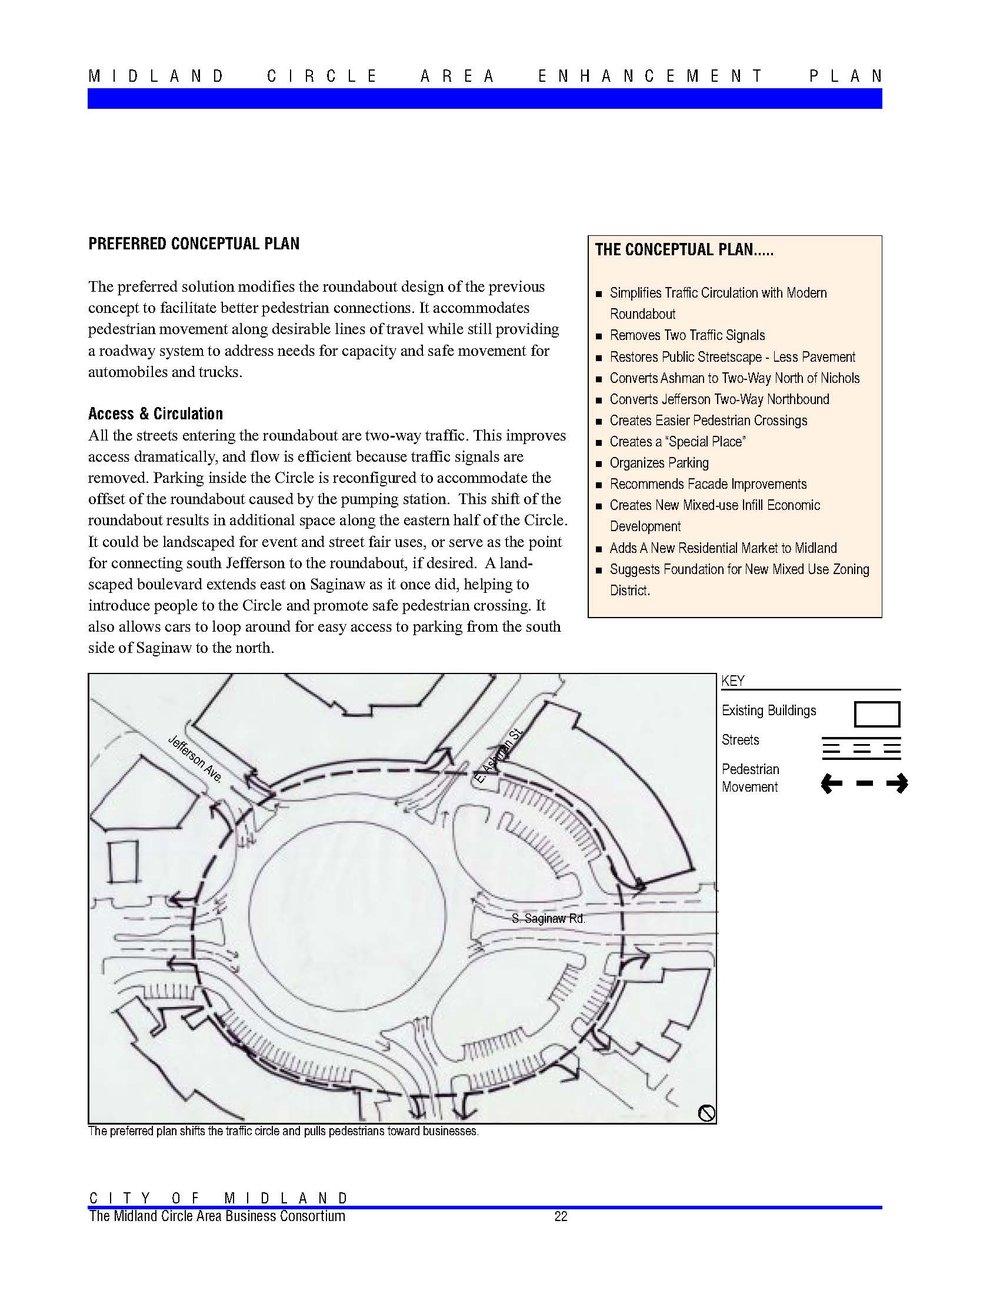 Ashman Circle Enhancement Plan_Page_24.jpg